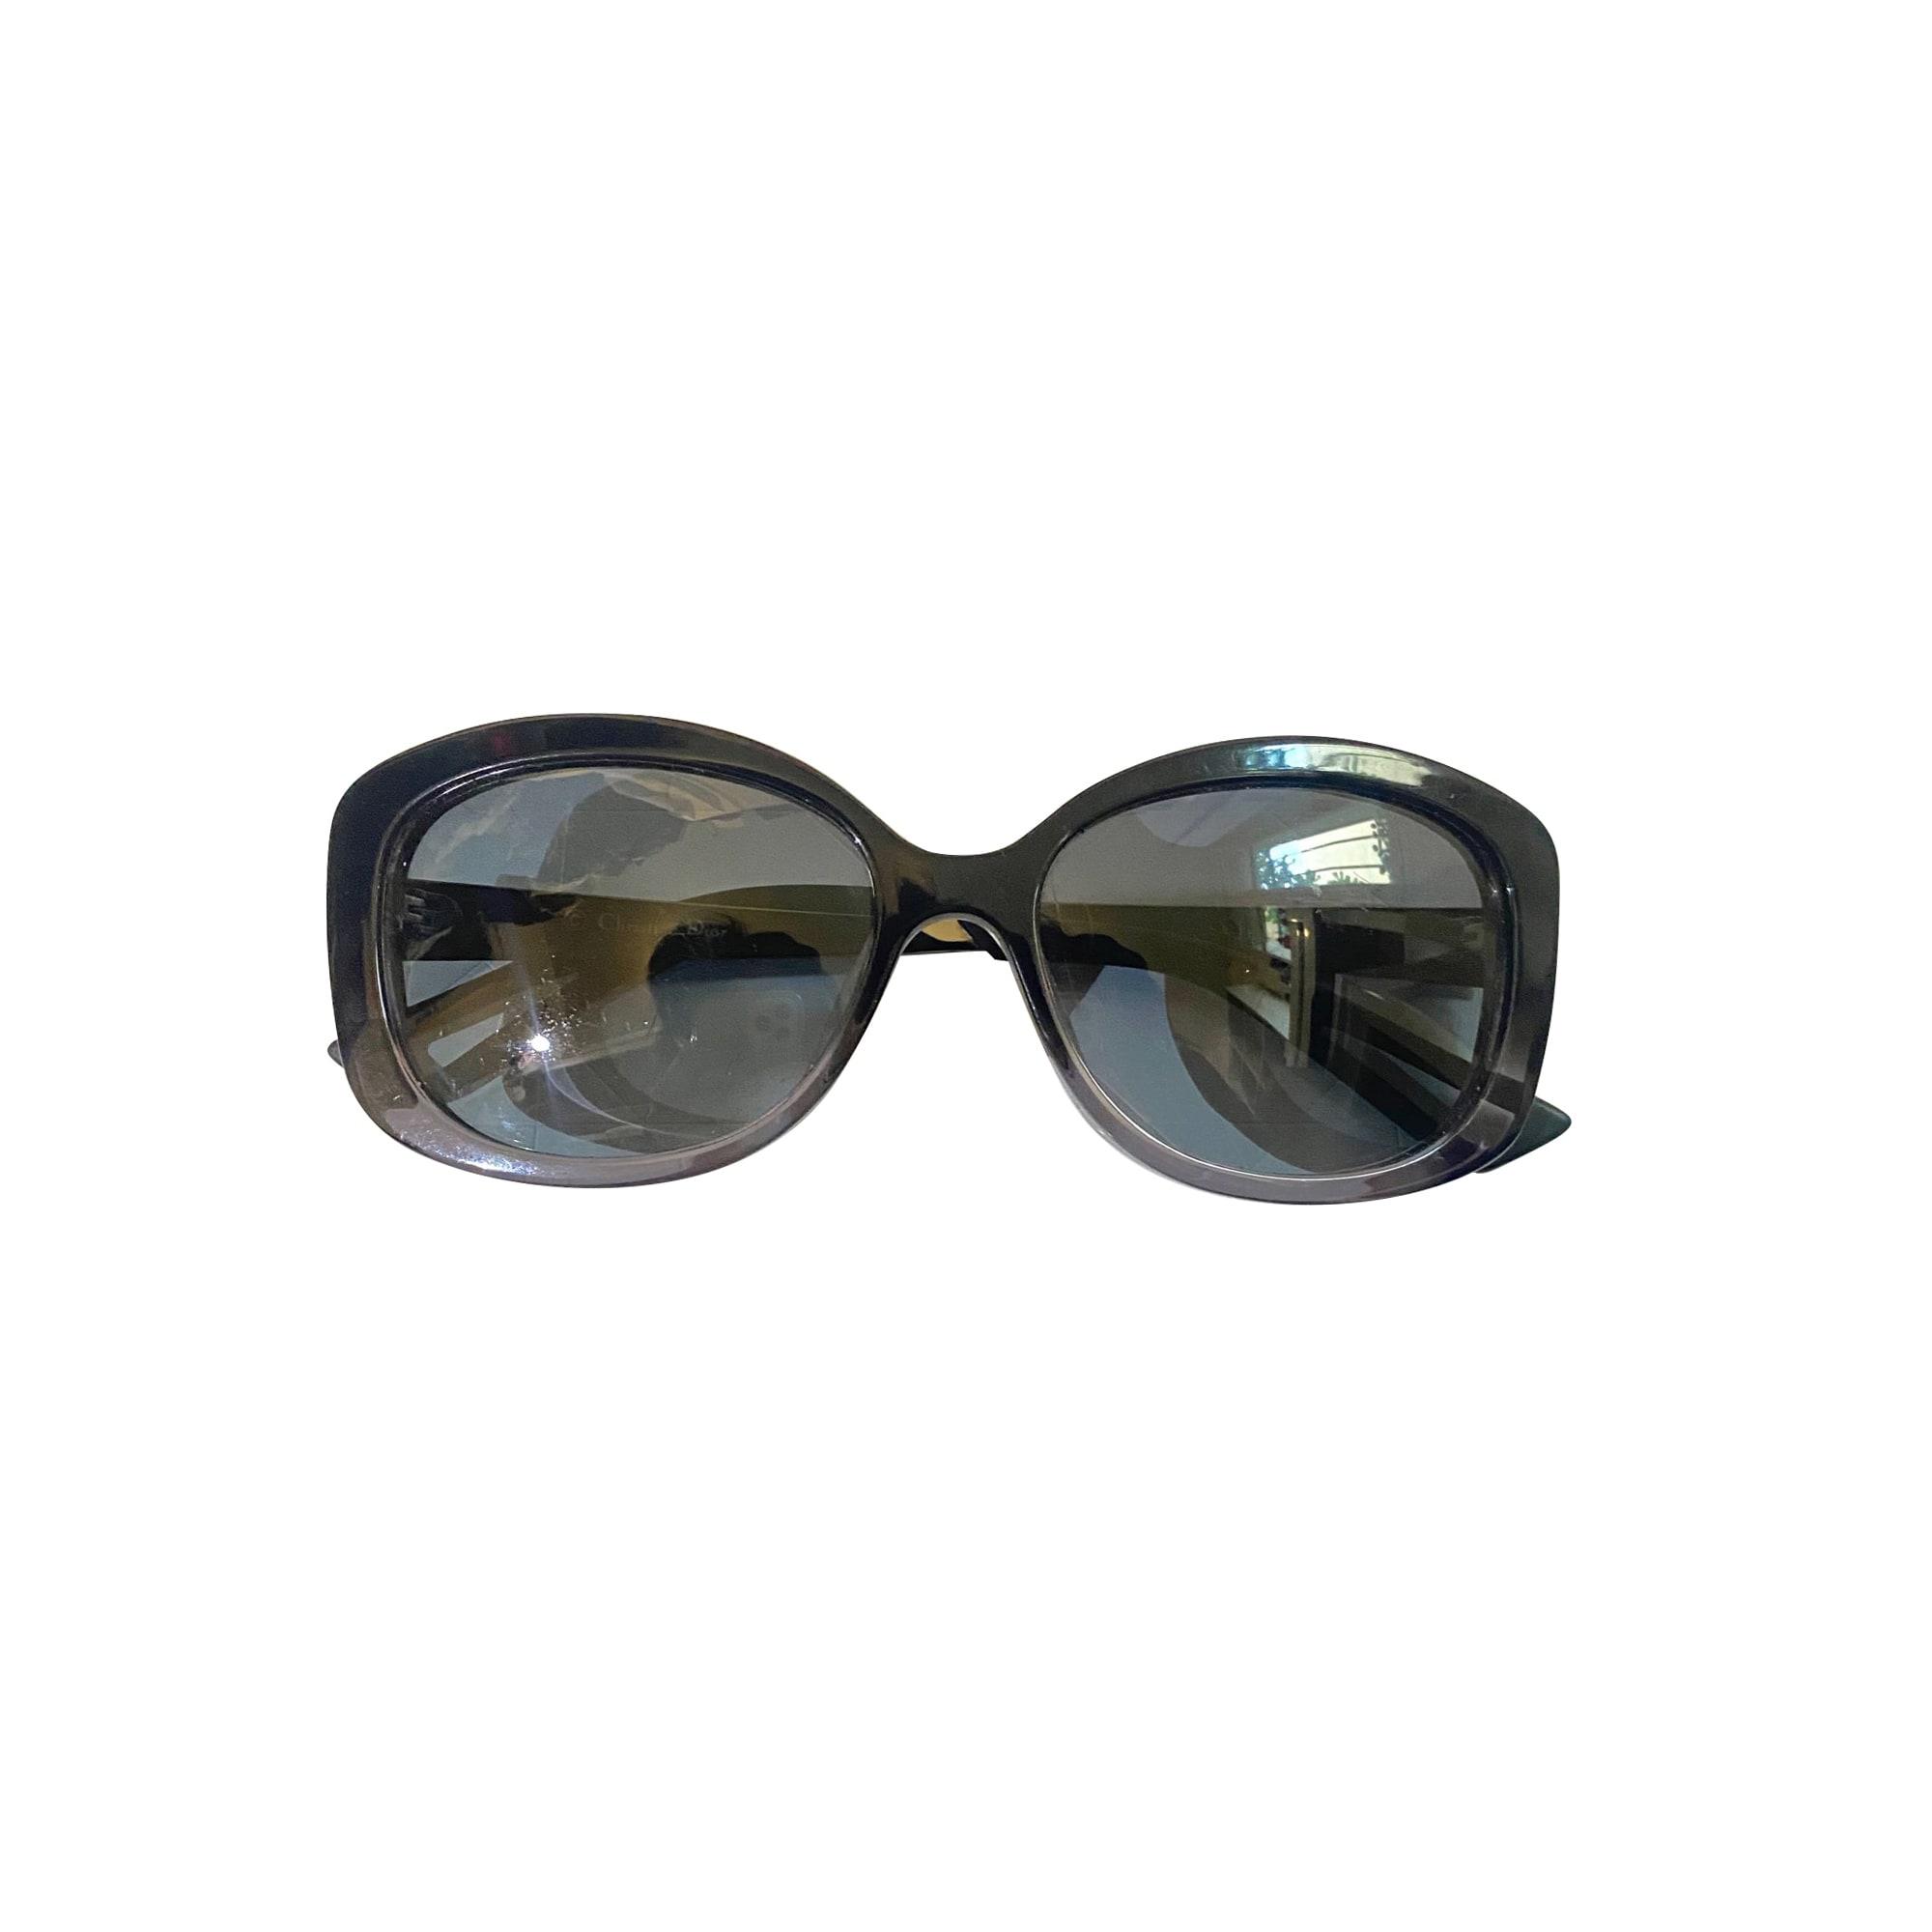 Sunglasses DIOR Black